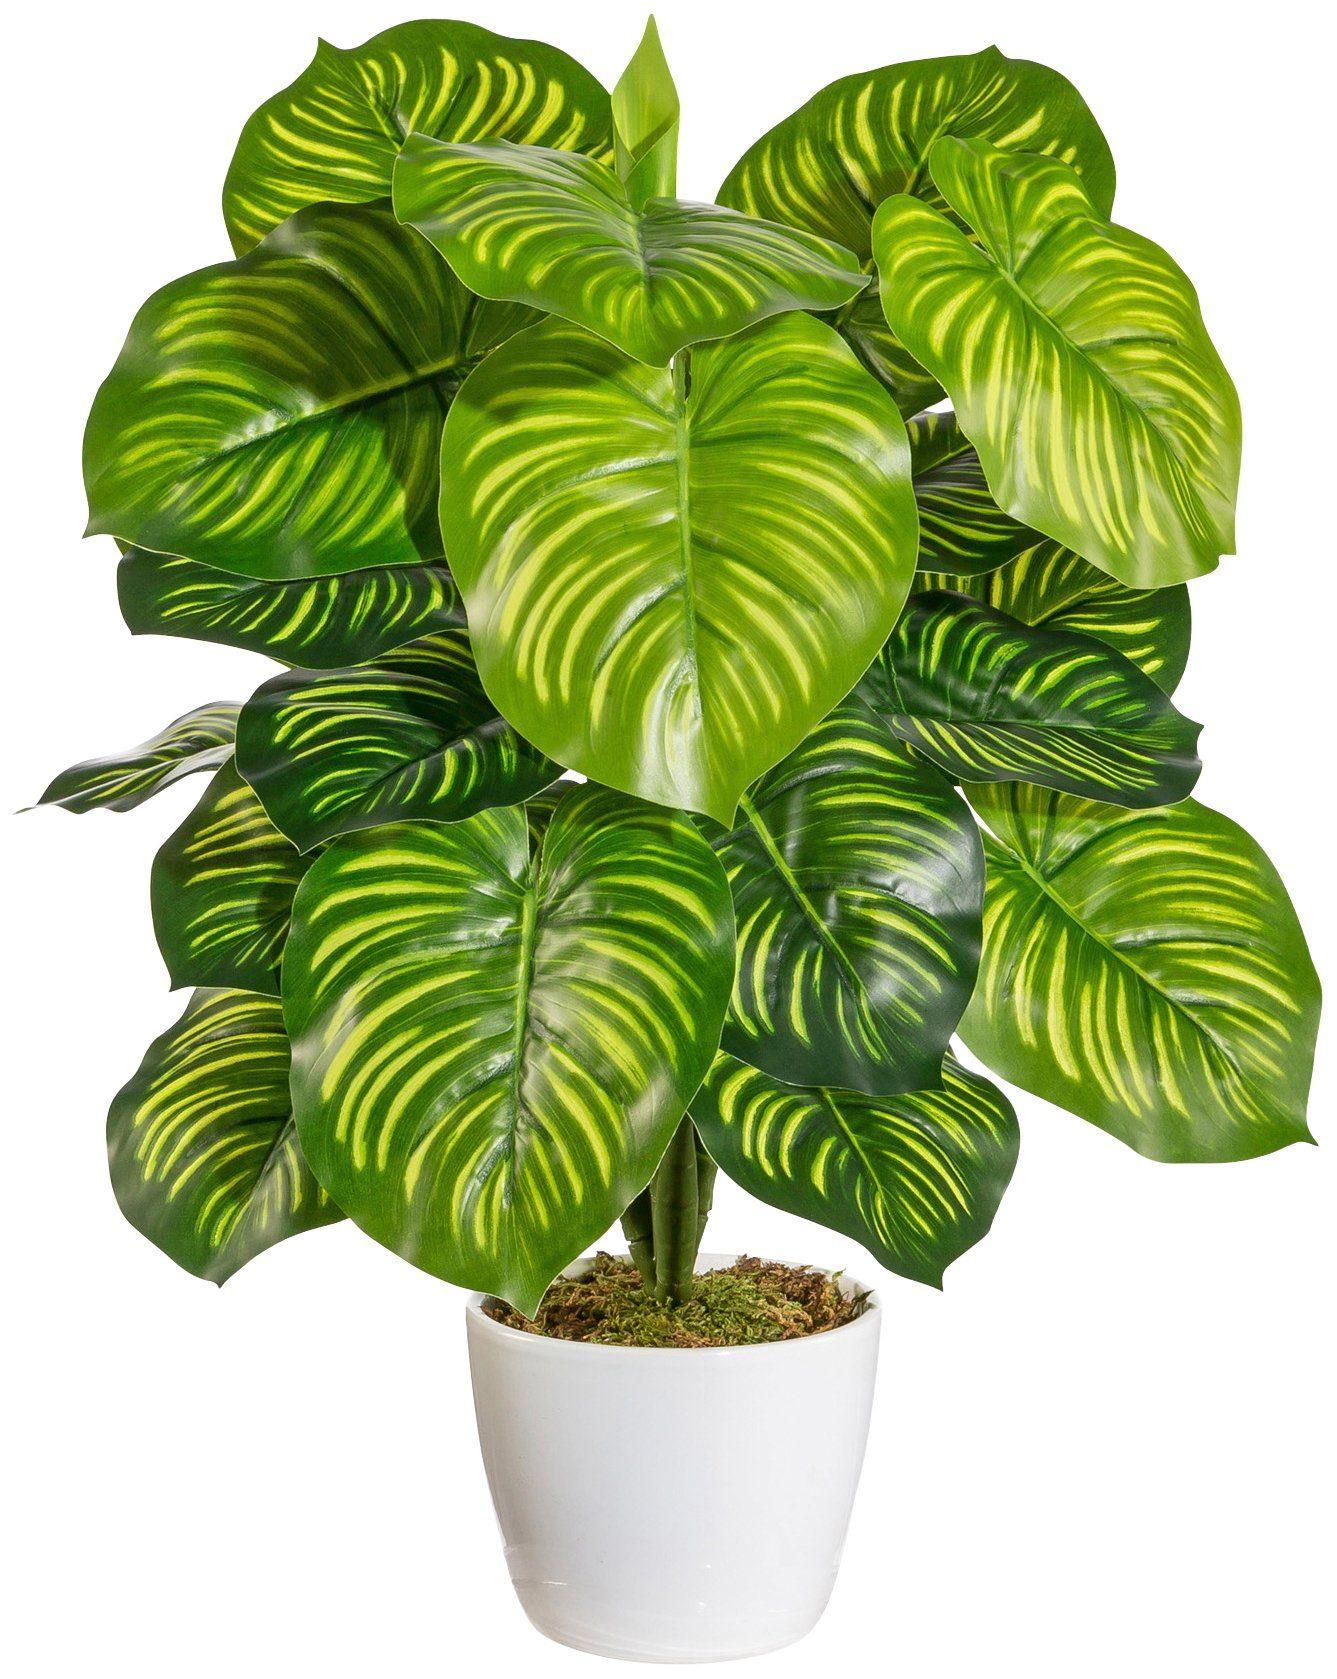 Kunstpflanze »Marantabusch«, im Keramiktopf mit Moos, Höhe 50 cm